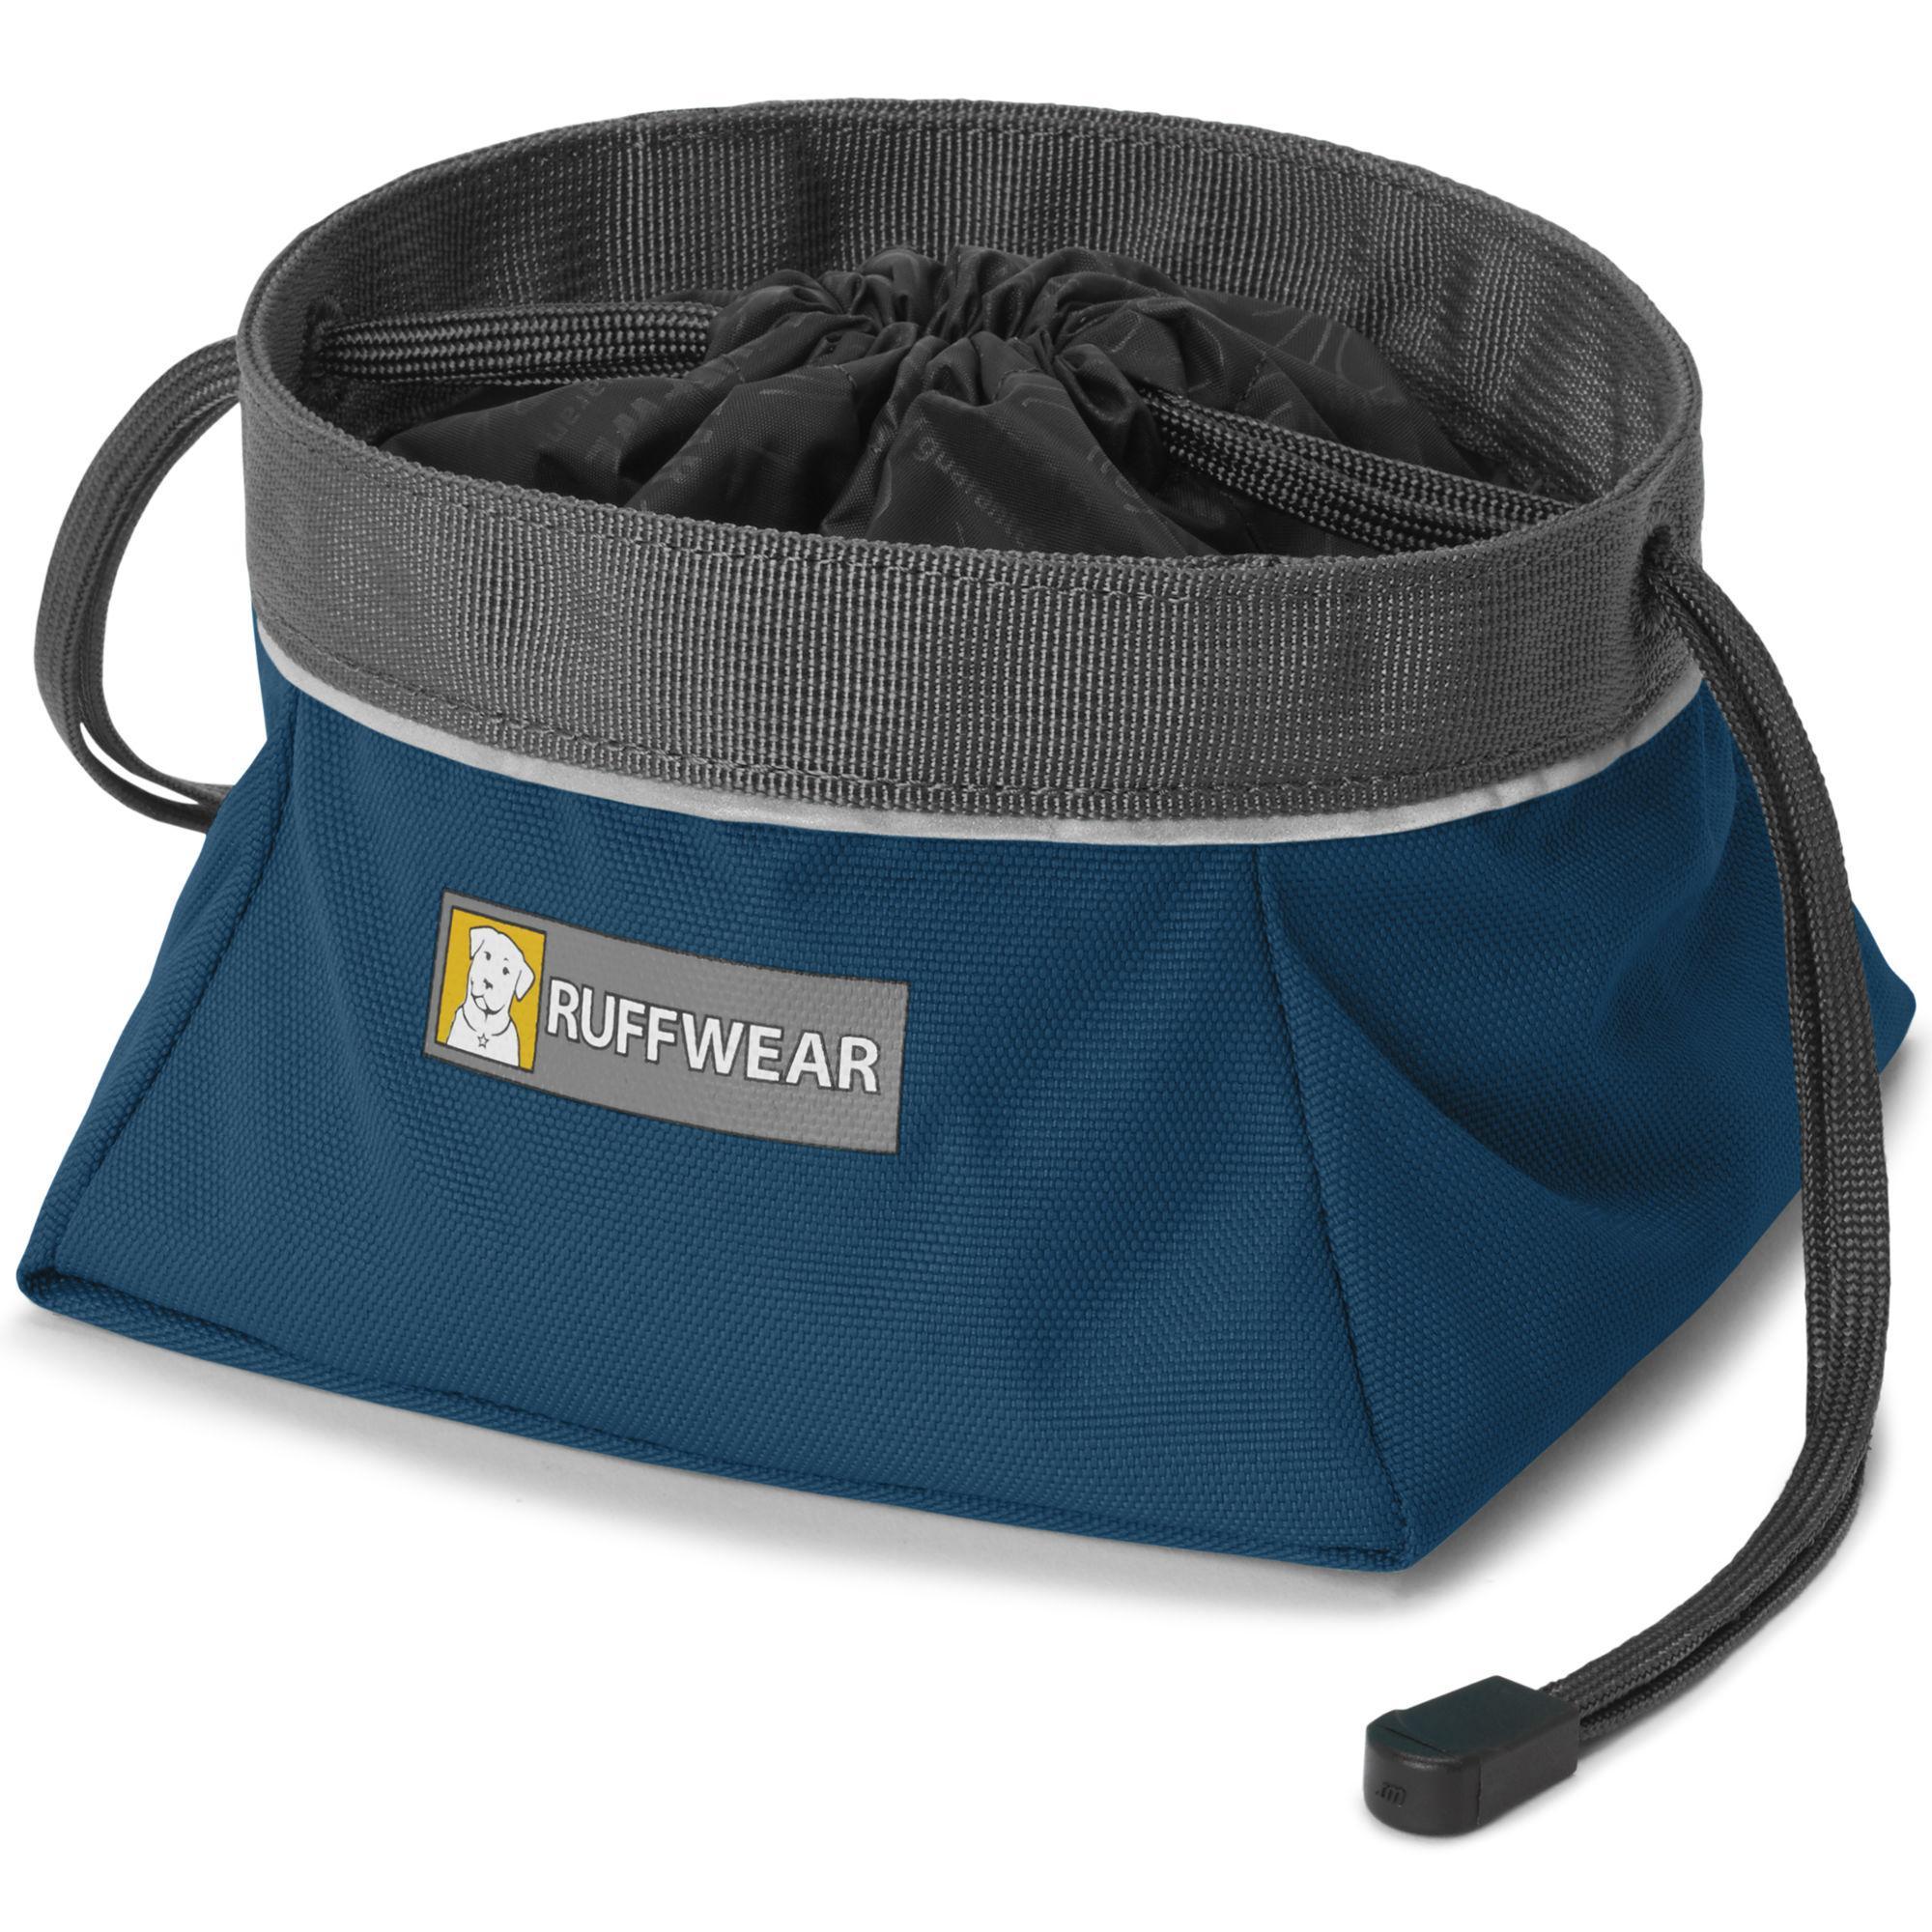 Quencher Cinch Top Dog Bowl by RuffWear - Blue Moon